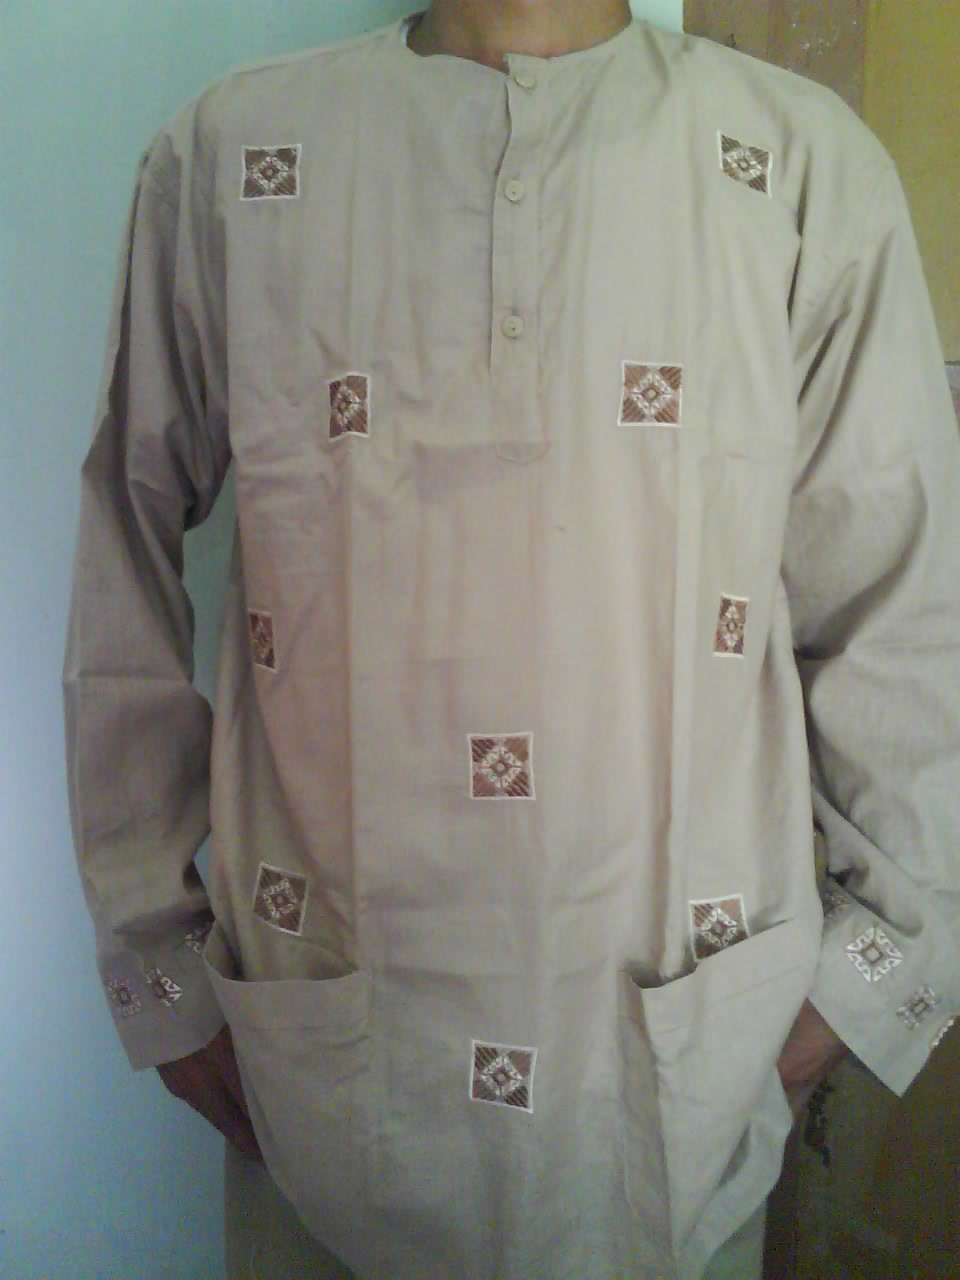 Baju koko rumahmadanicom monggomir online baju koko Baju gamis almia terbaru